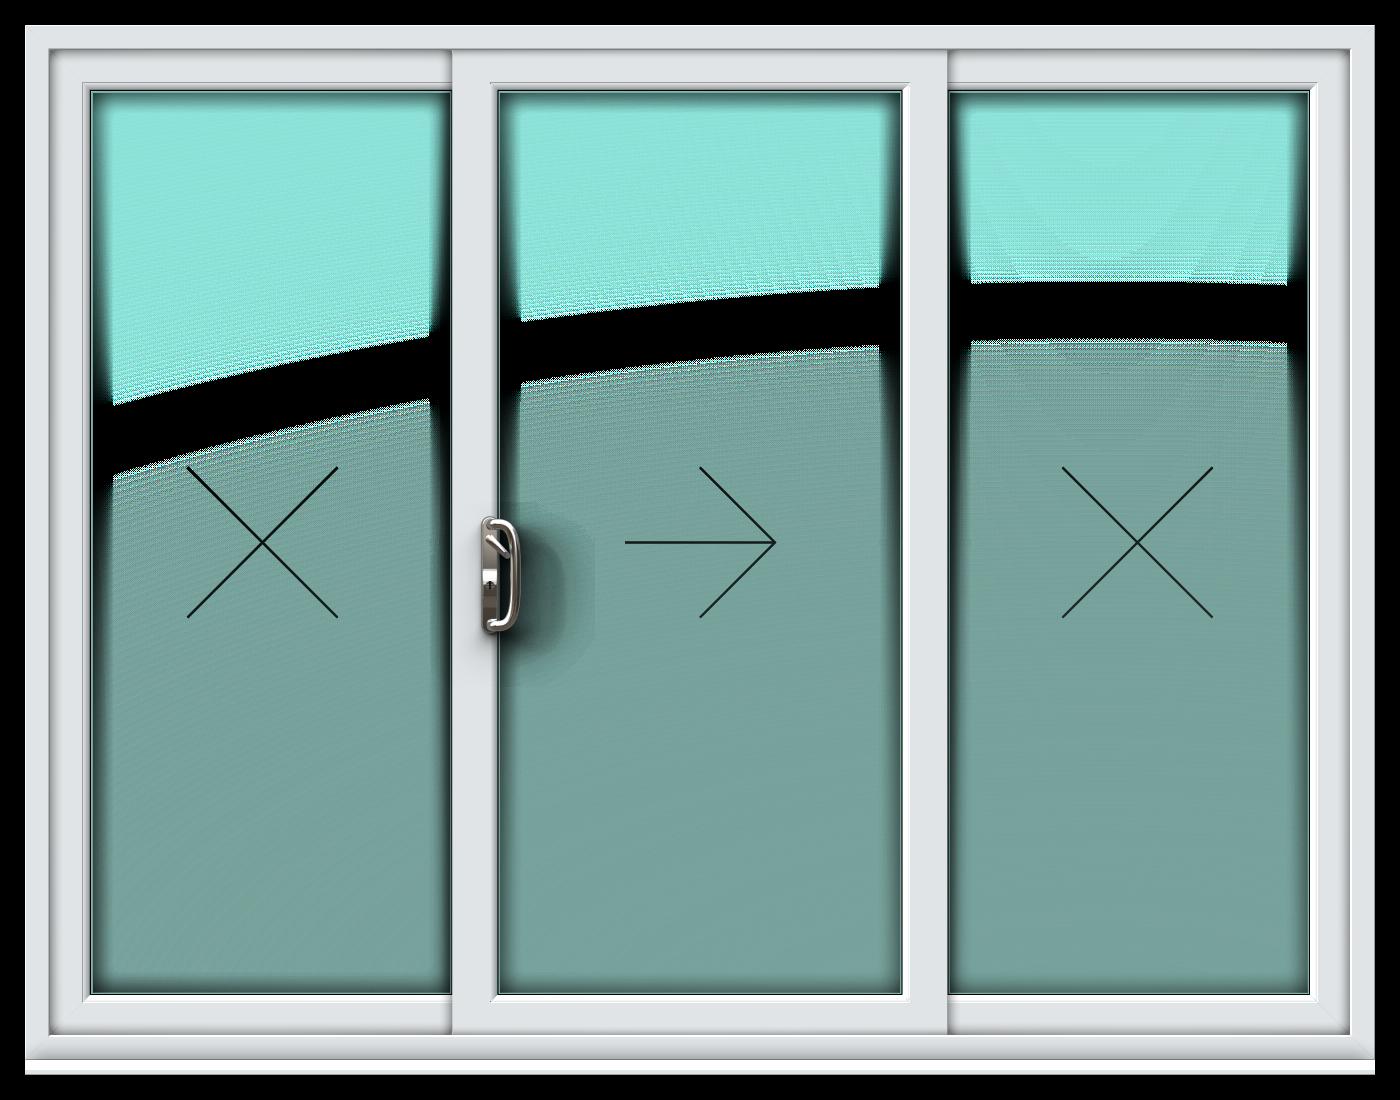 Delicieux 3 Pane Sliding Patio Door U2013 Sides Fixed/Centre Sliding